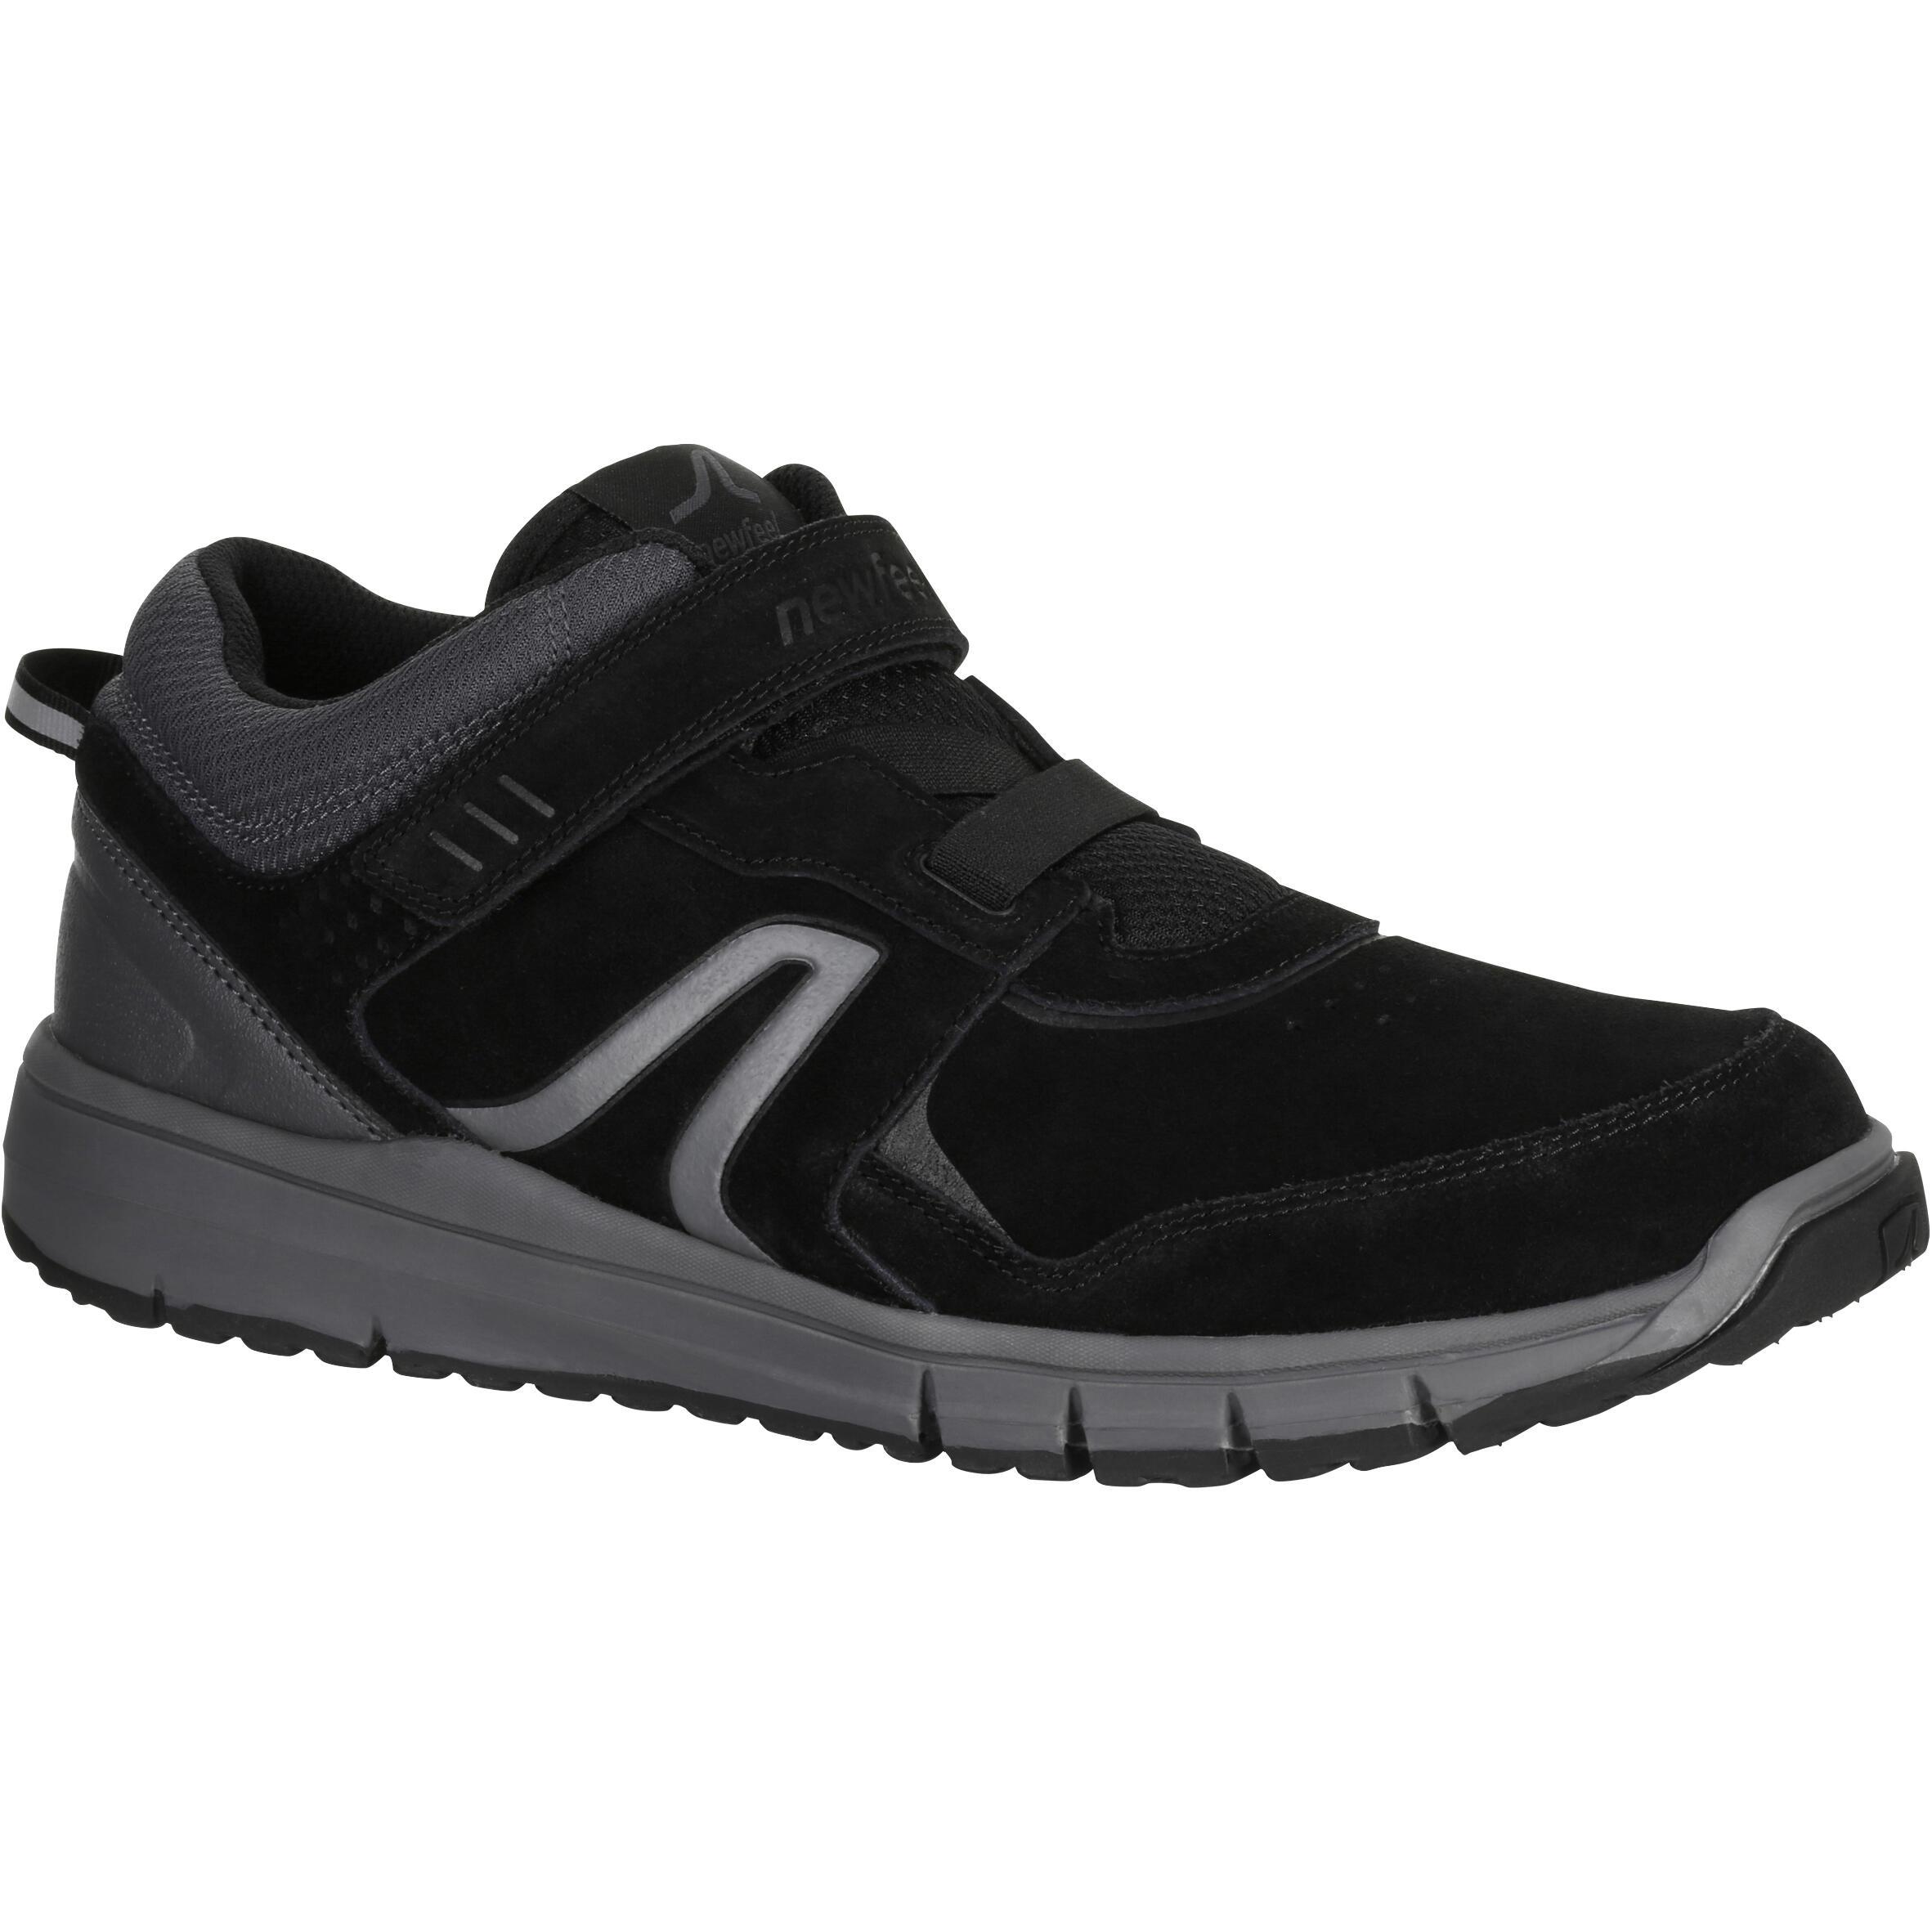 Chaussures marche sportive homme hw 140 strap cuir noir newfeel